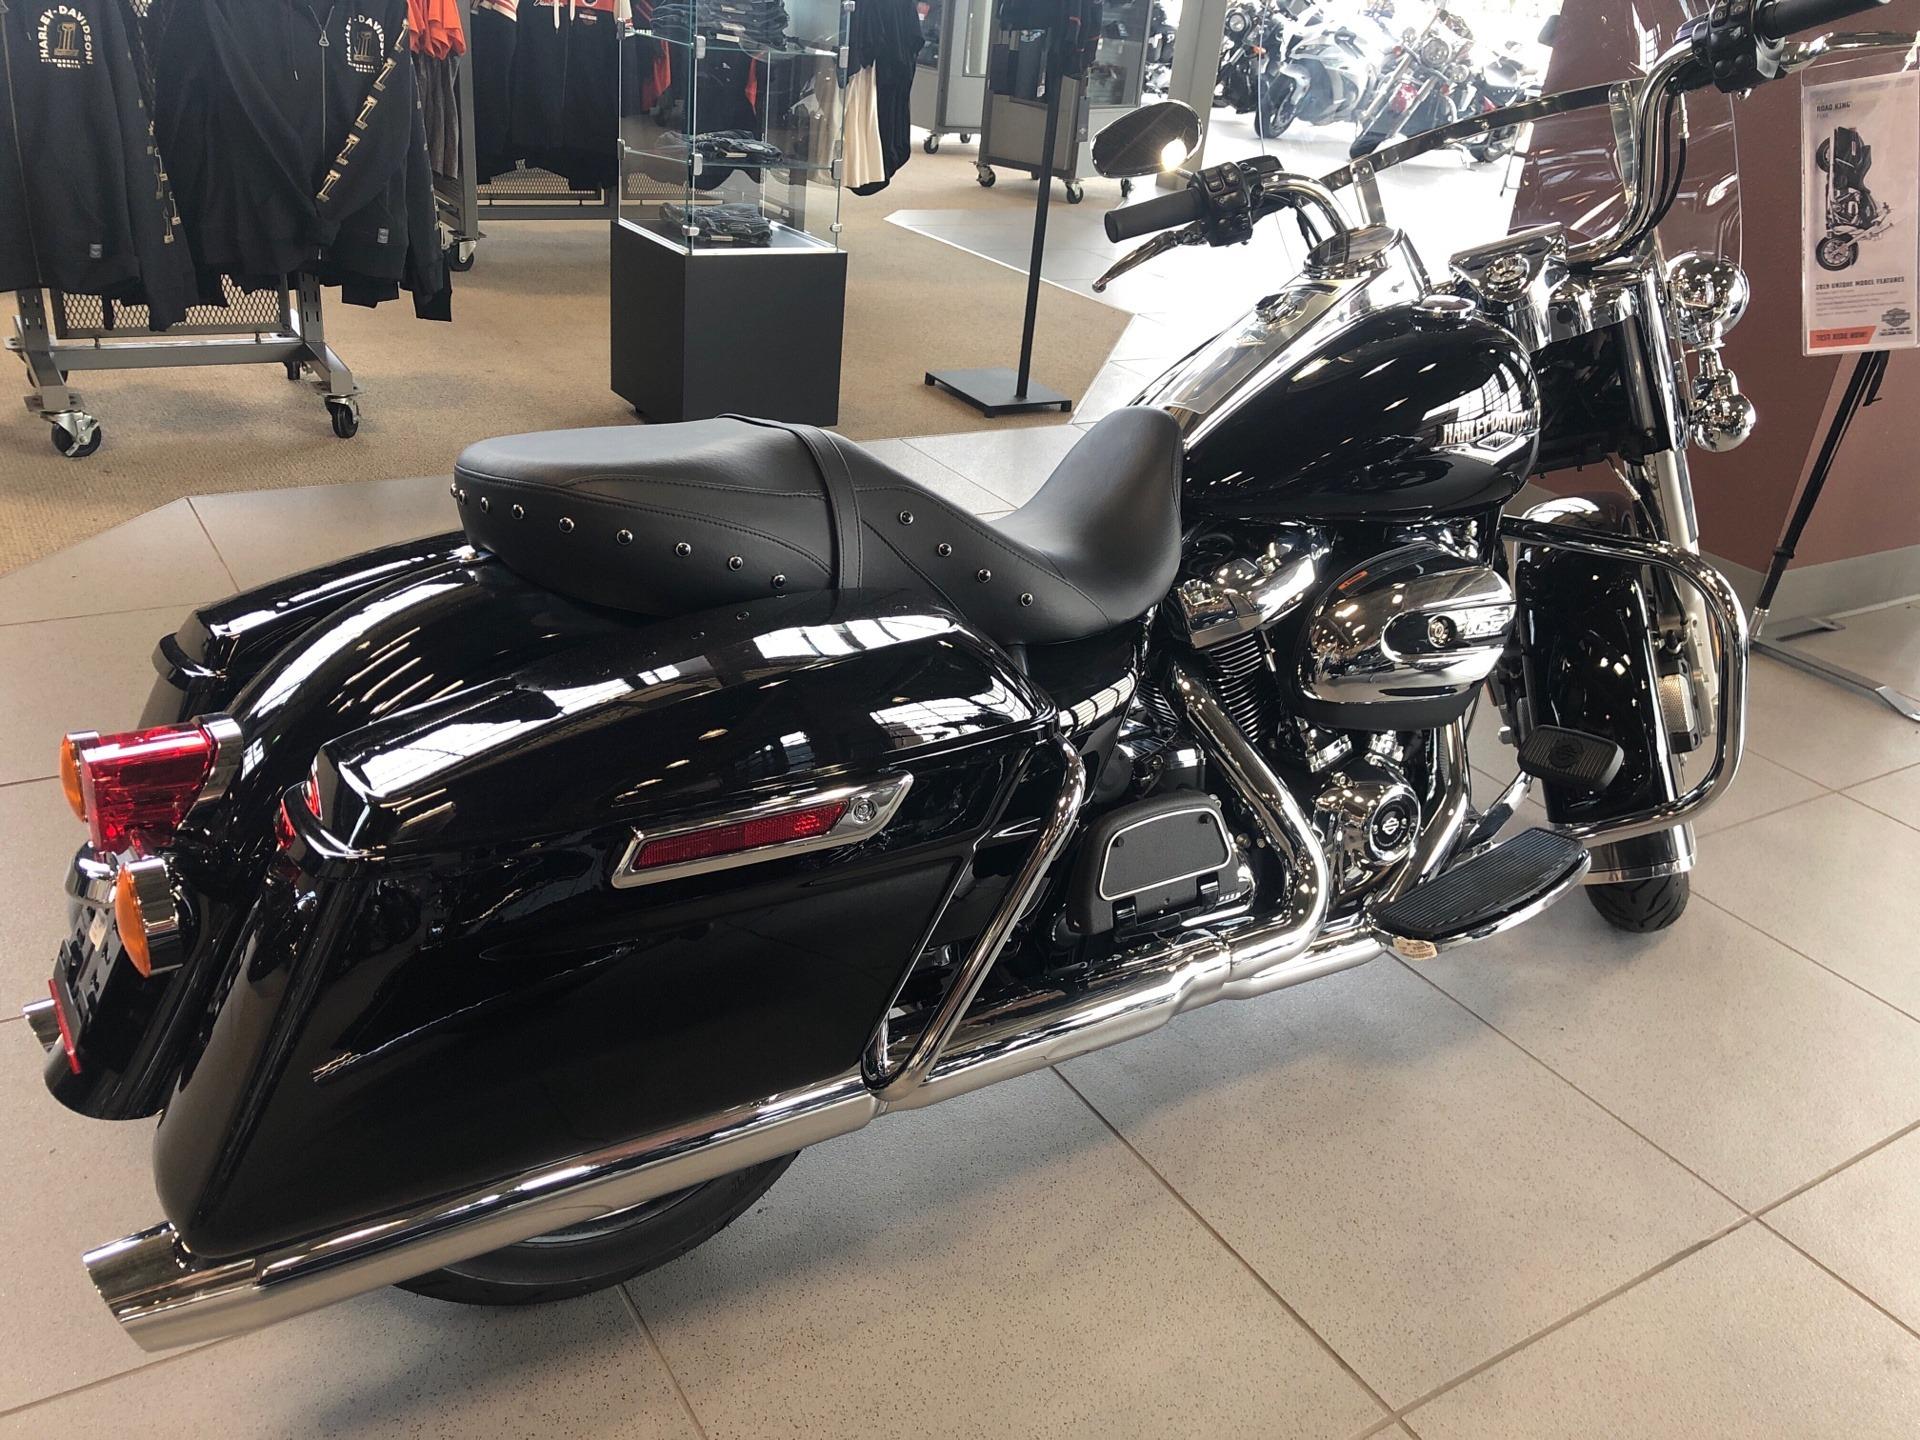 Used Tires Flint Mi >> New 2019 Harley Davidson Road King Motorcycles In Flint Mi